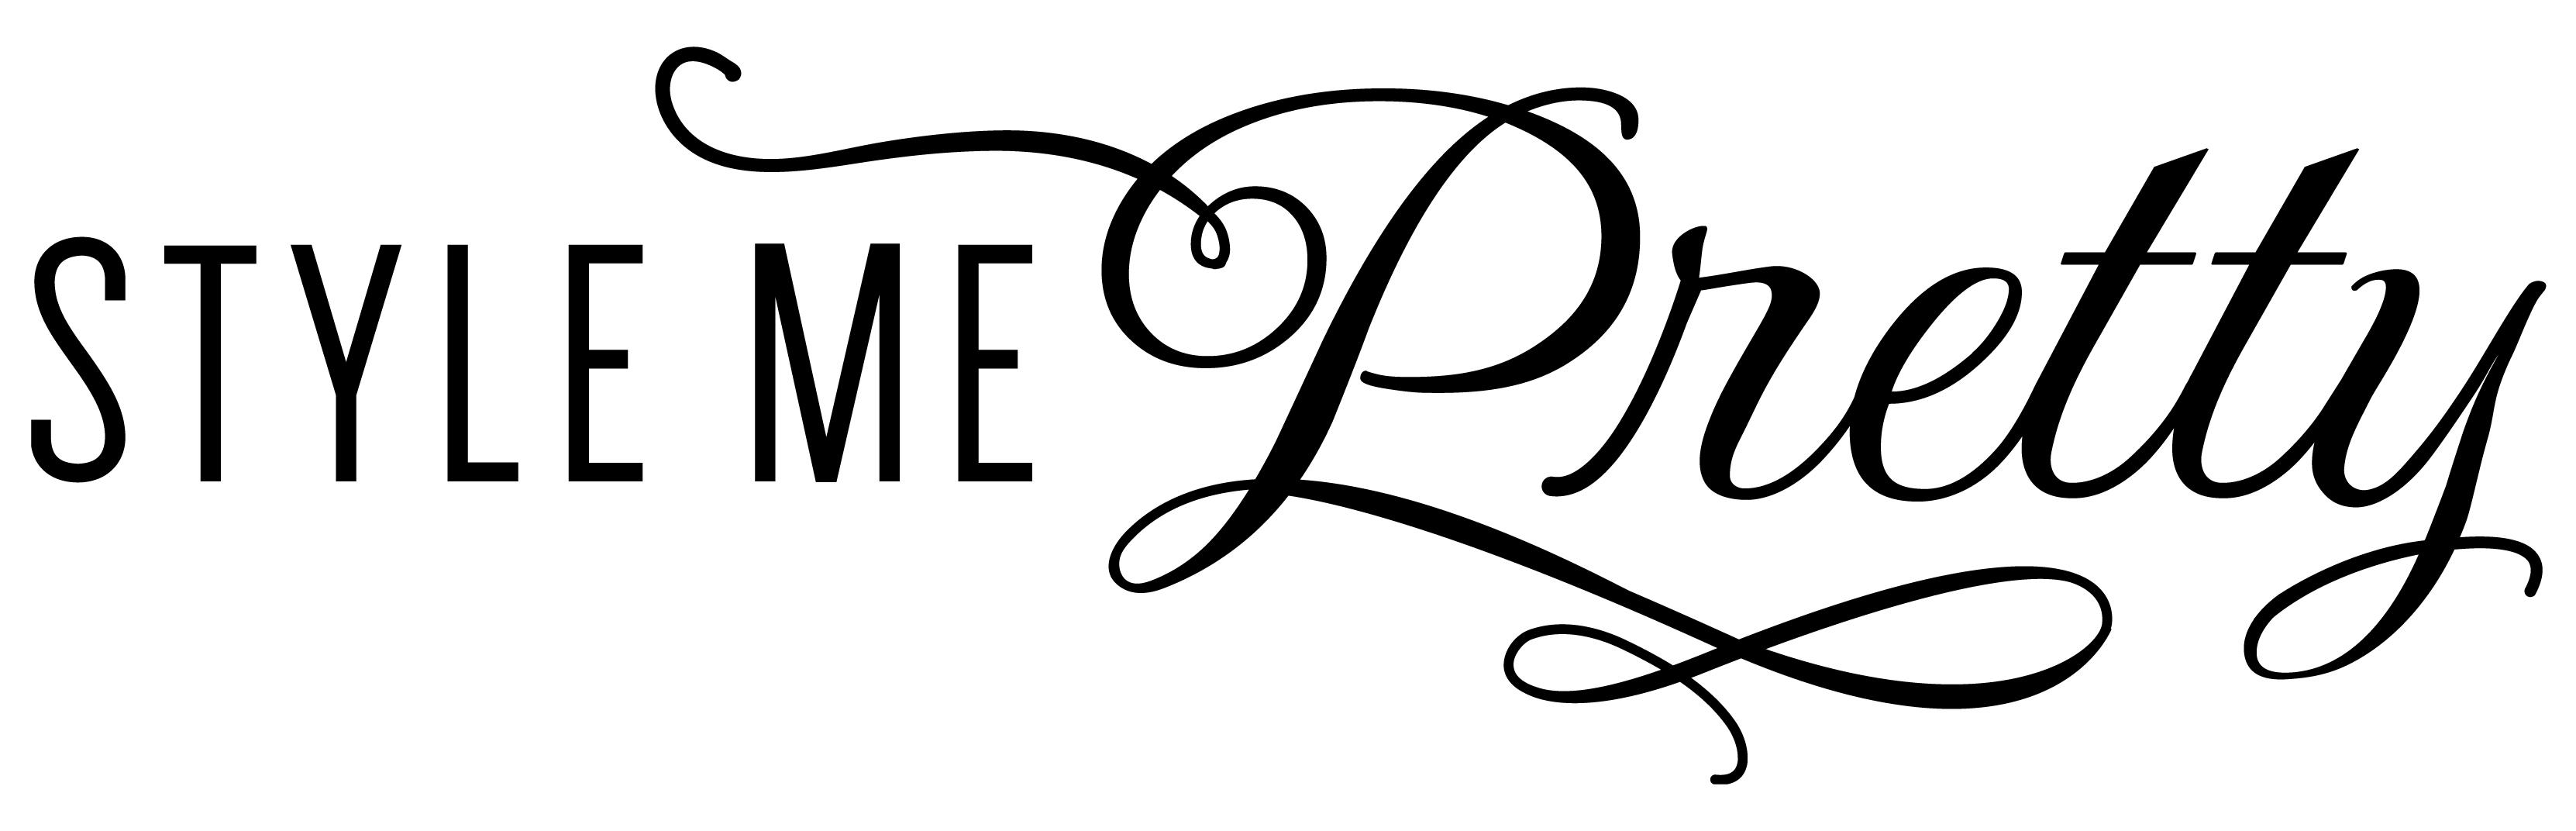 https://new.writefullysimple.com/wp-content/uploads/2017/12/style-me-pretty-logo.jpg